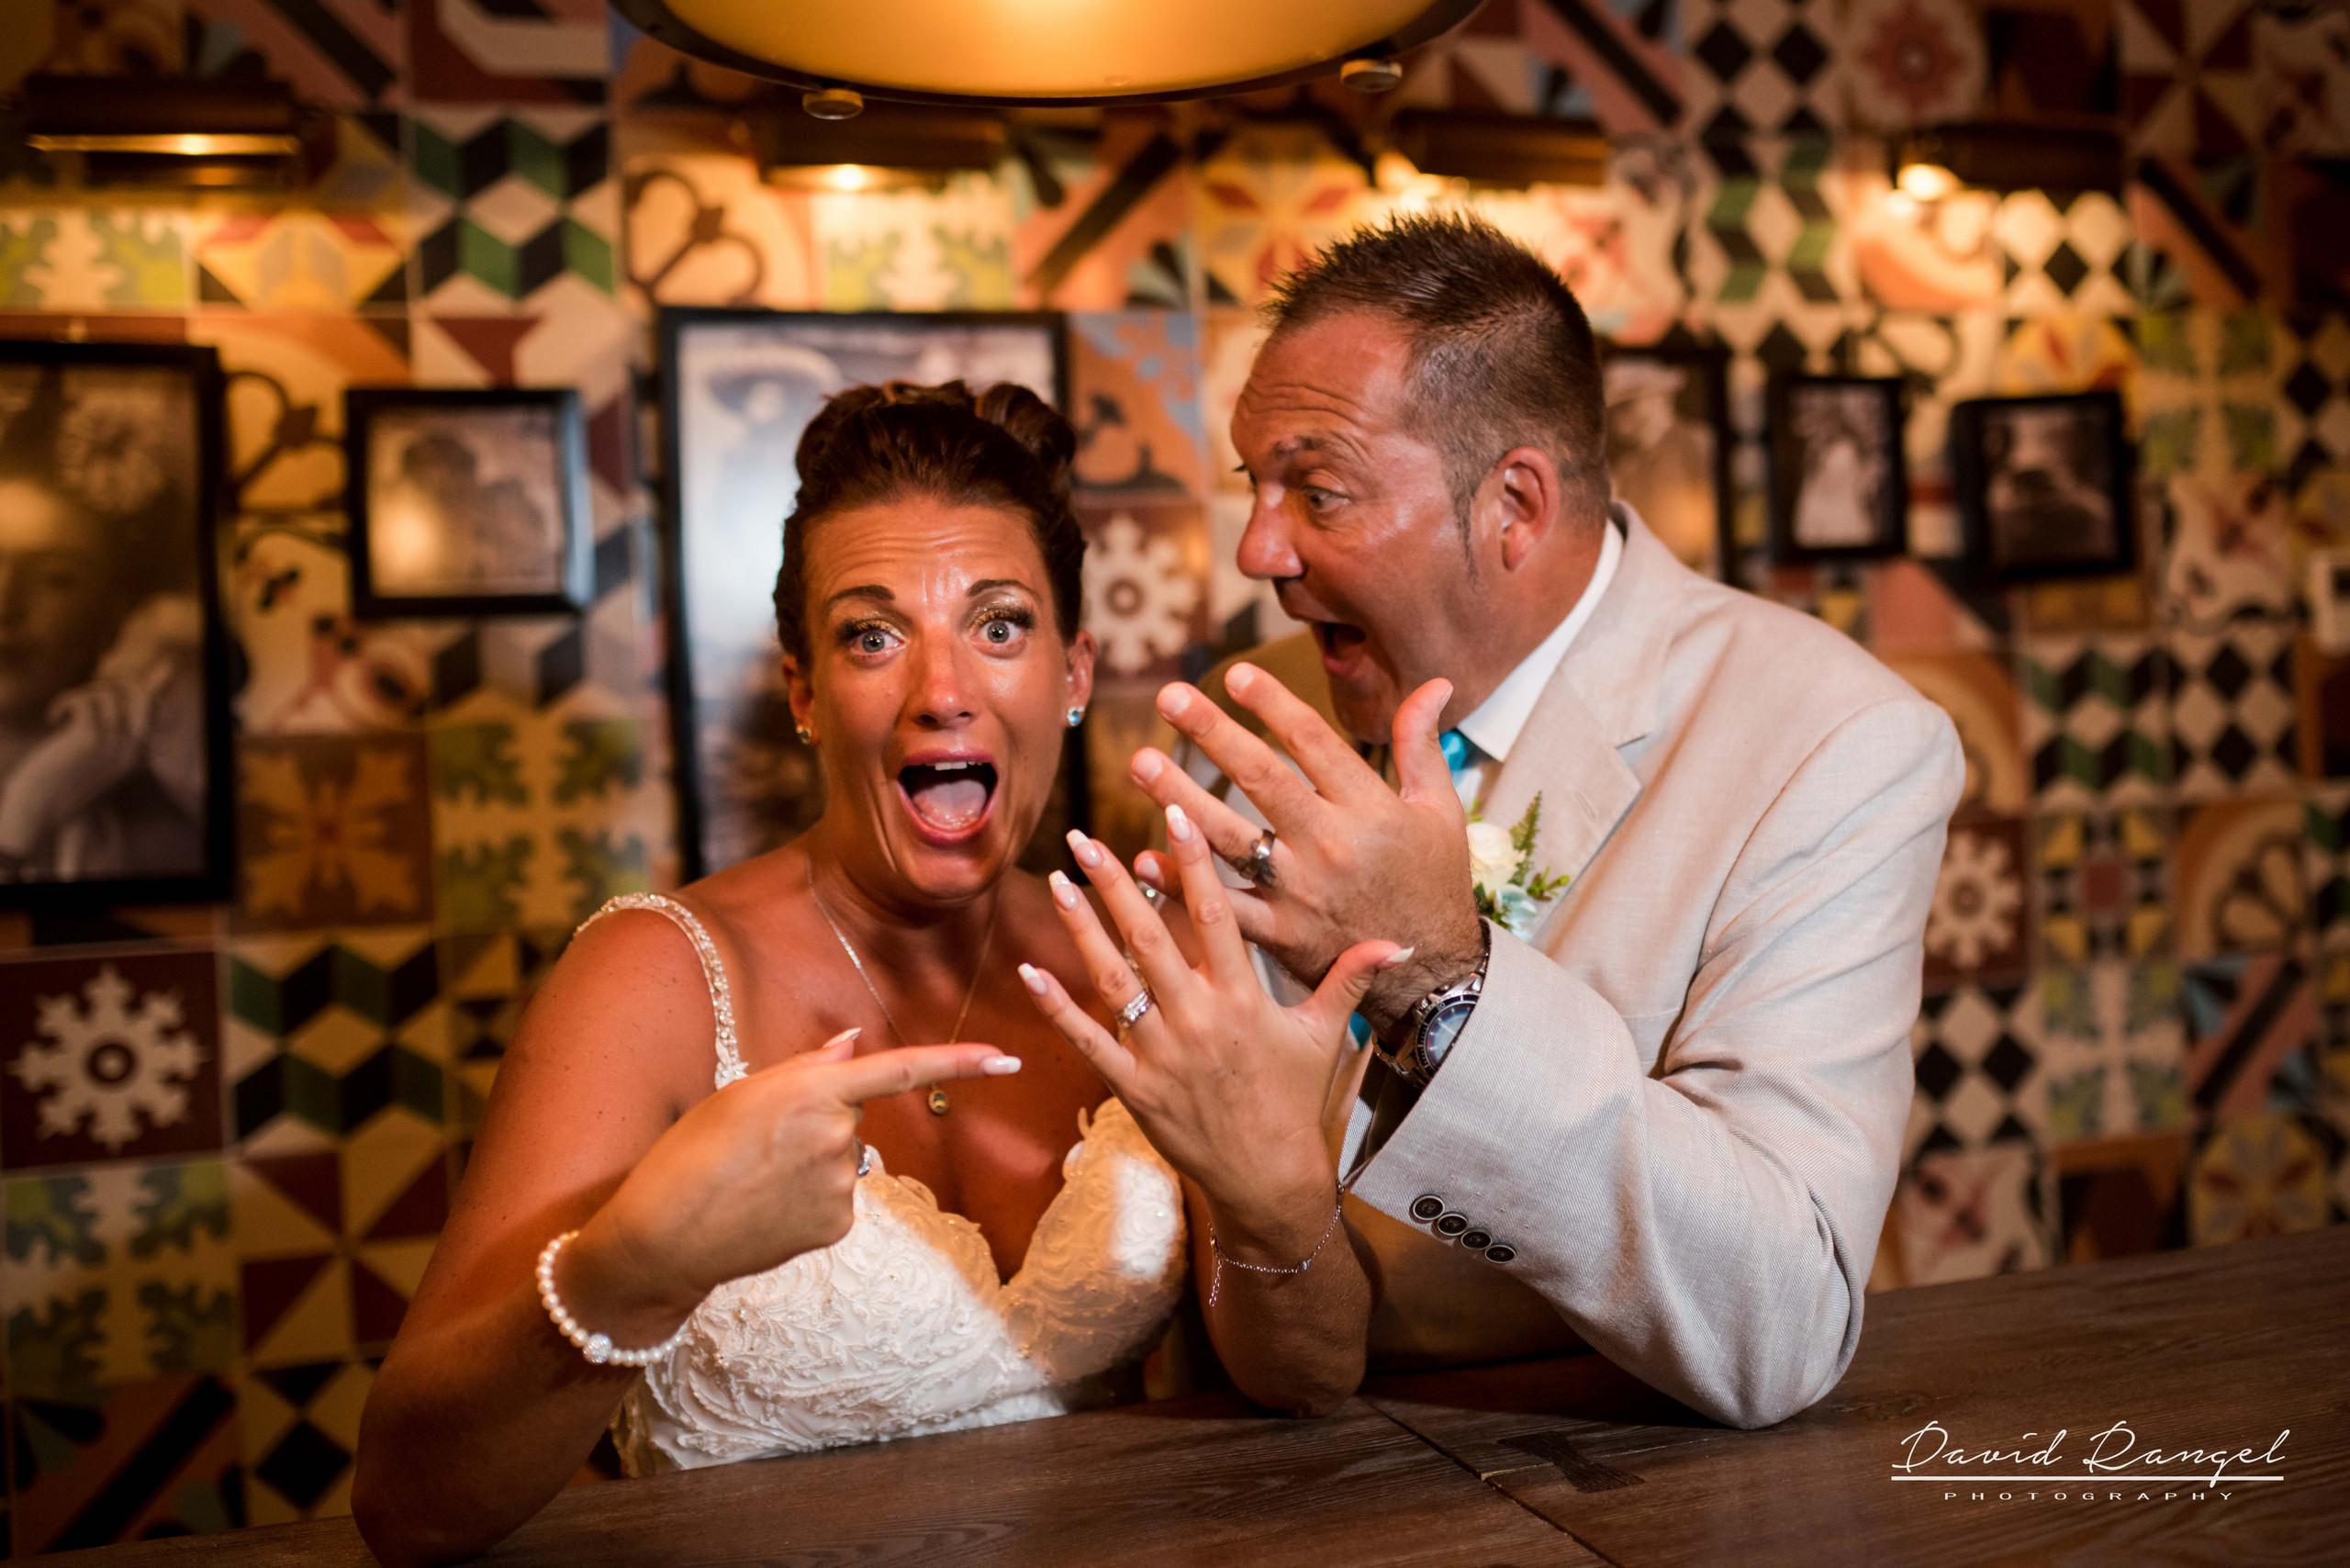 wedding+rings+photo